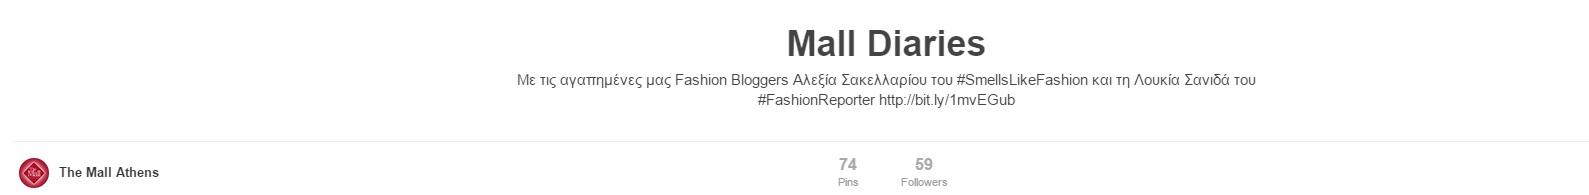 mall diaries 1